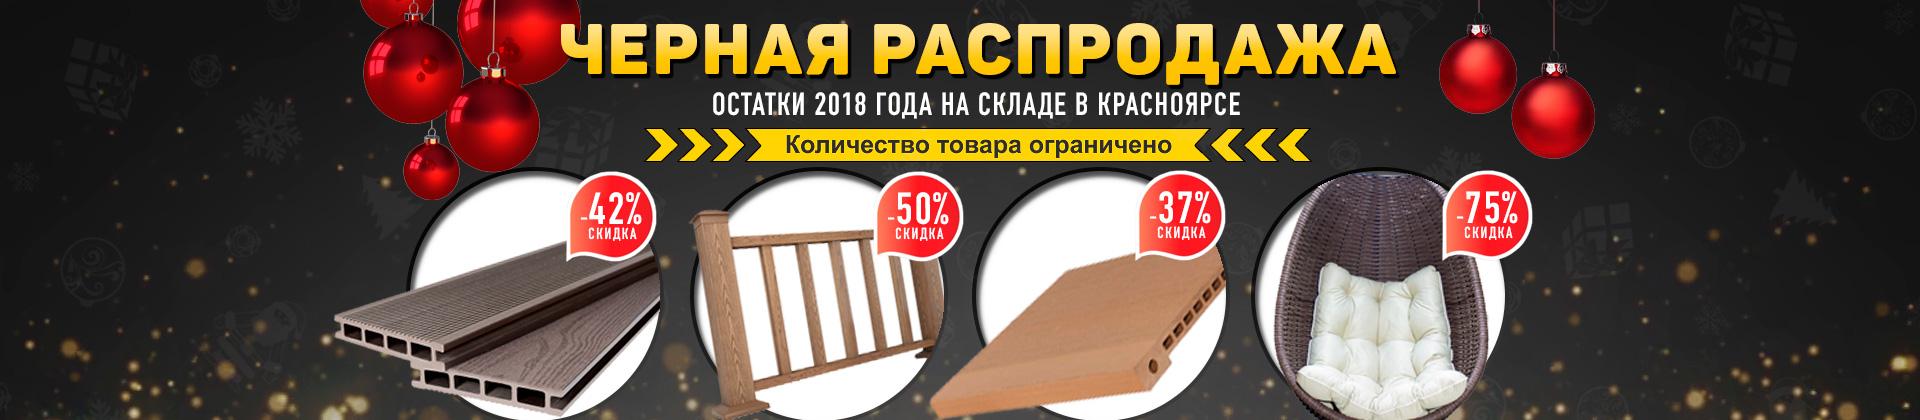 slide-rasprodaga-2019-11-20-3